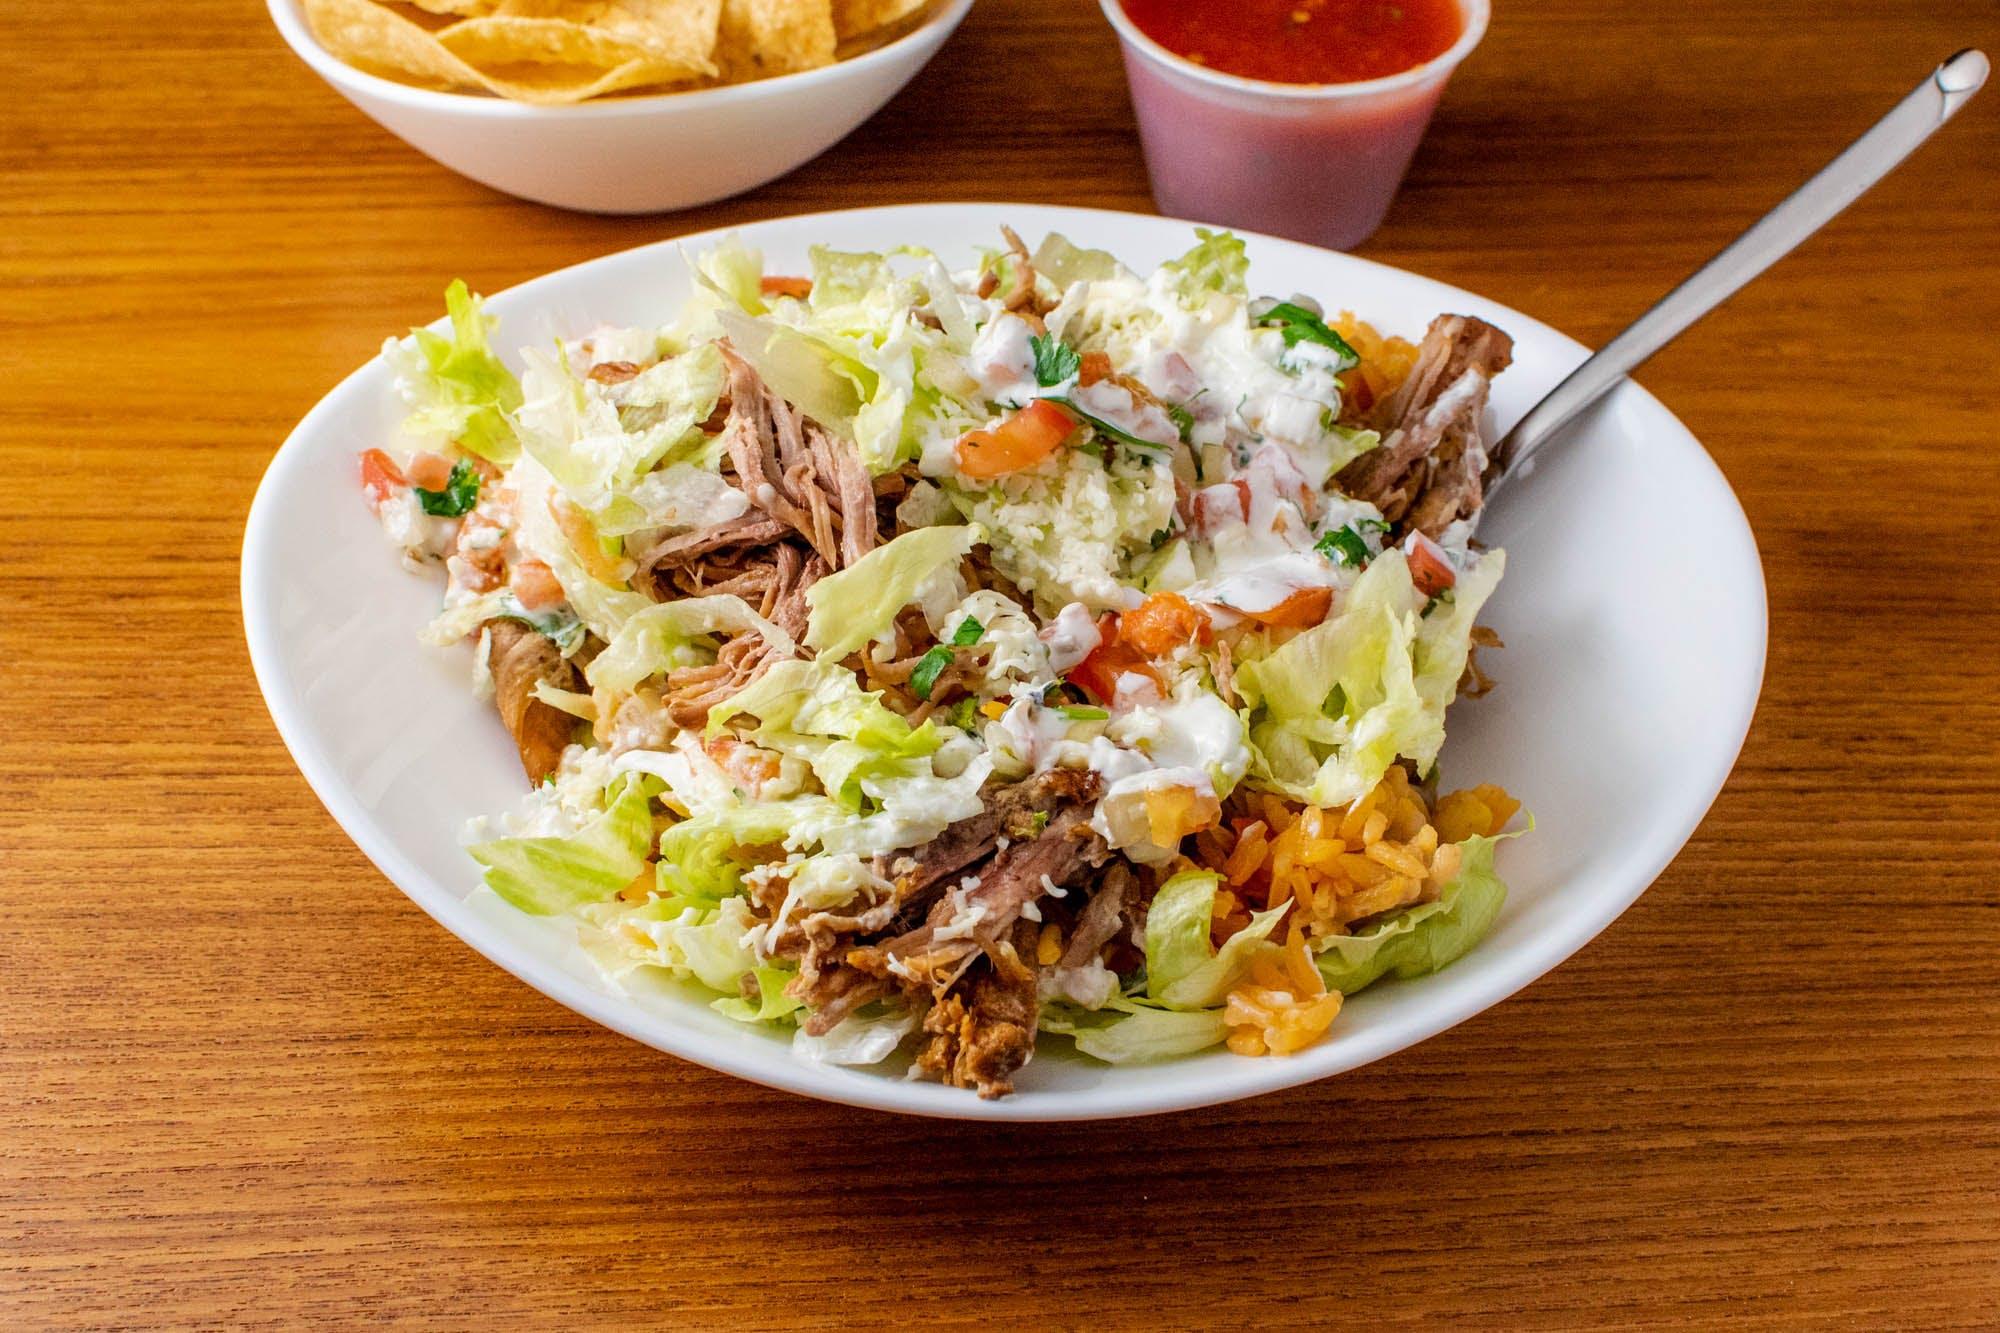 Burrito Bowl from La Penca Mexican Restaurant in Madison, WI